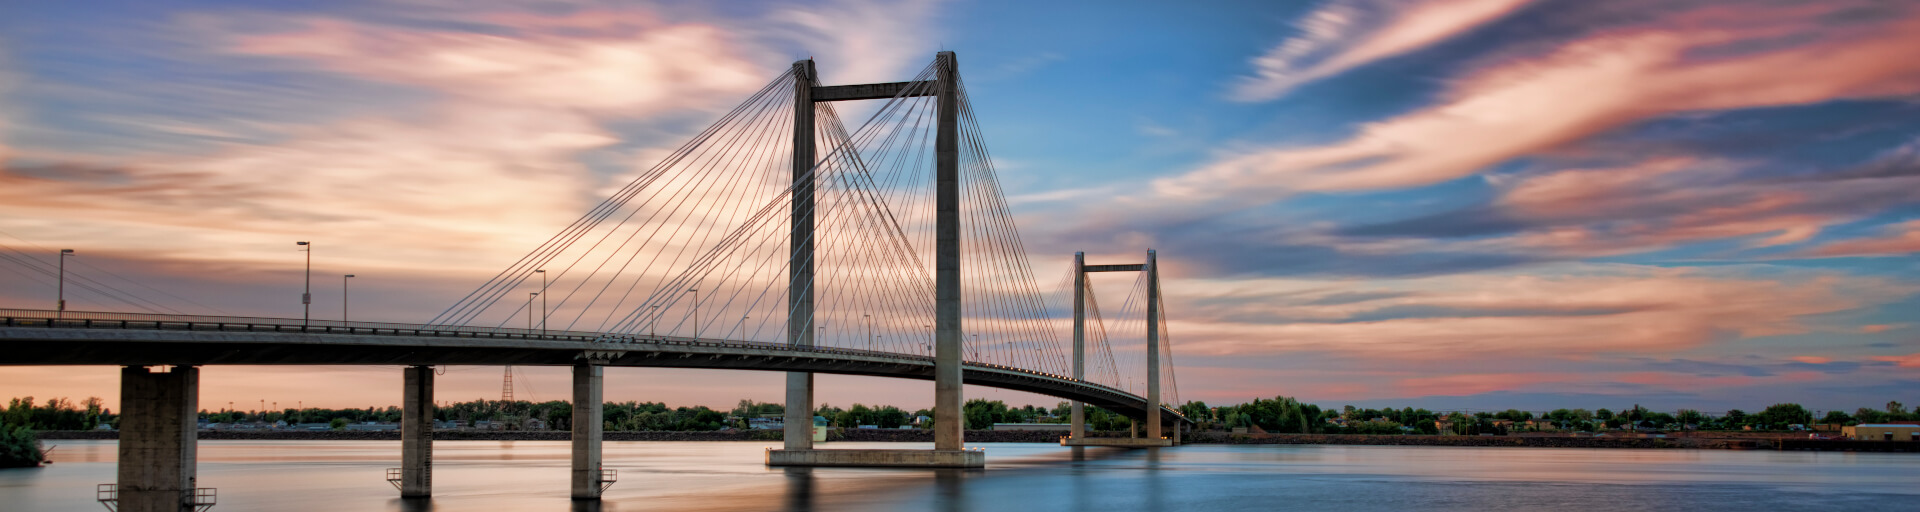 Bridge Purple Sky Arbitration PERC